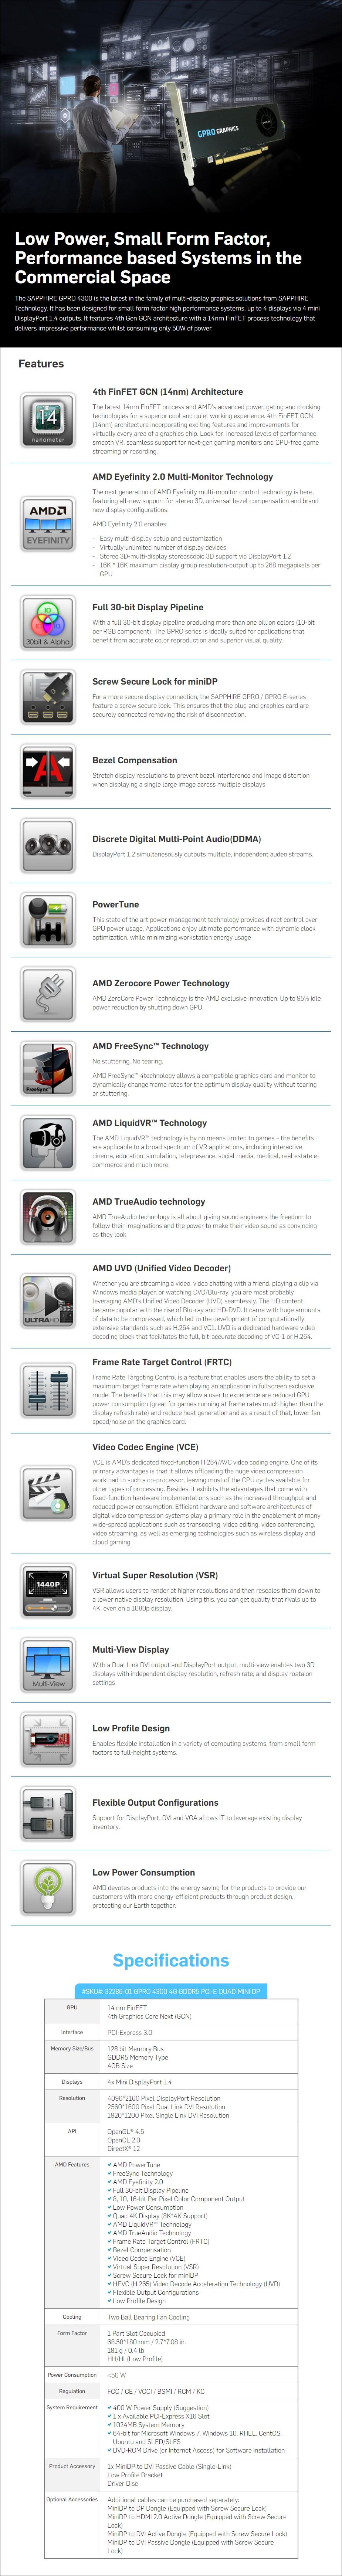 Sapphire GPRO 4300 4GB GDDR5 Video Card - Overview 1